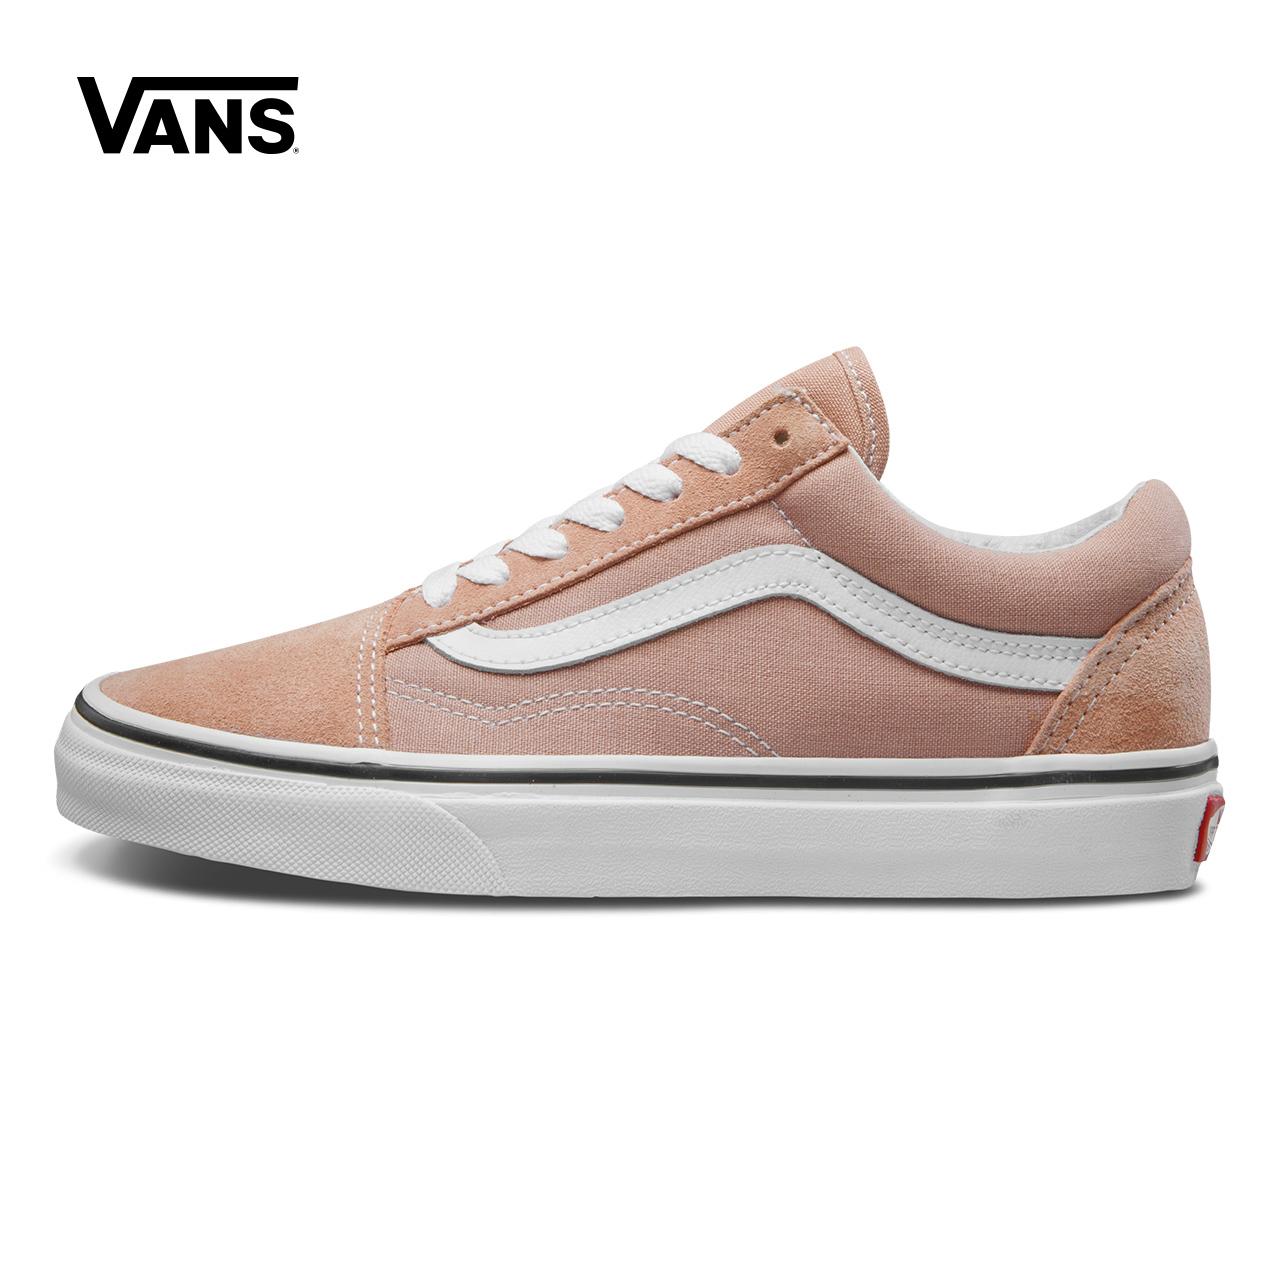 Vans 范斯官方女款OLD SKOOL板鞋|VN0A38G1QQ6